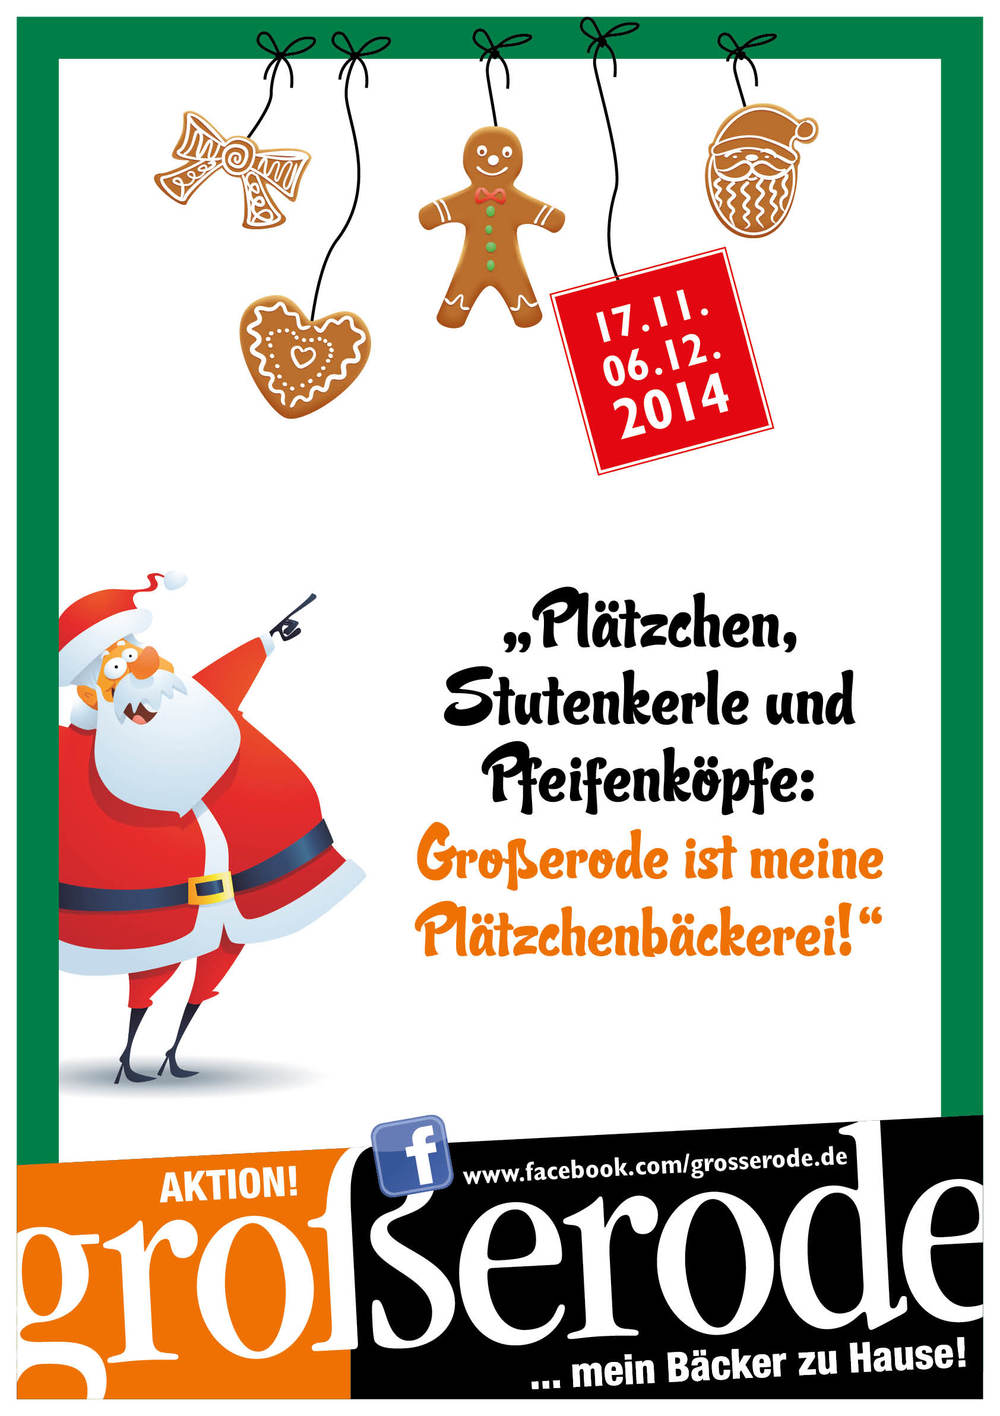 20141104_Grosserode_Plaetzchenaktion_Web.jpg